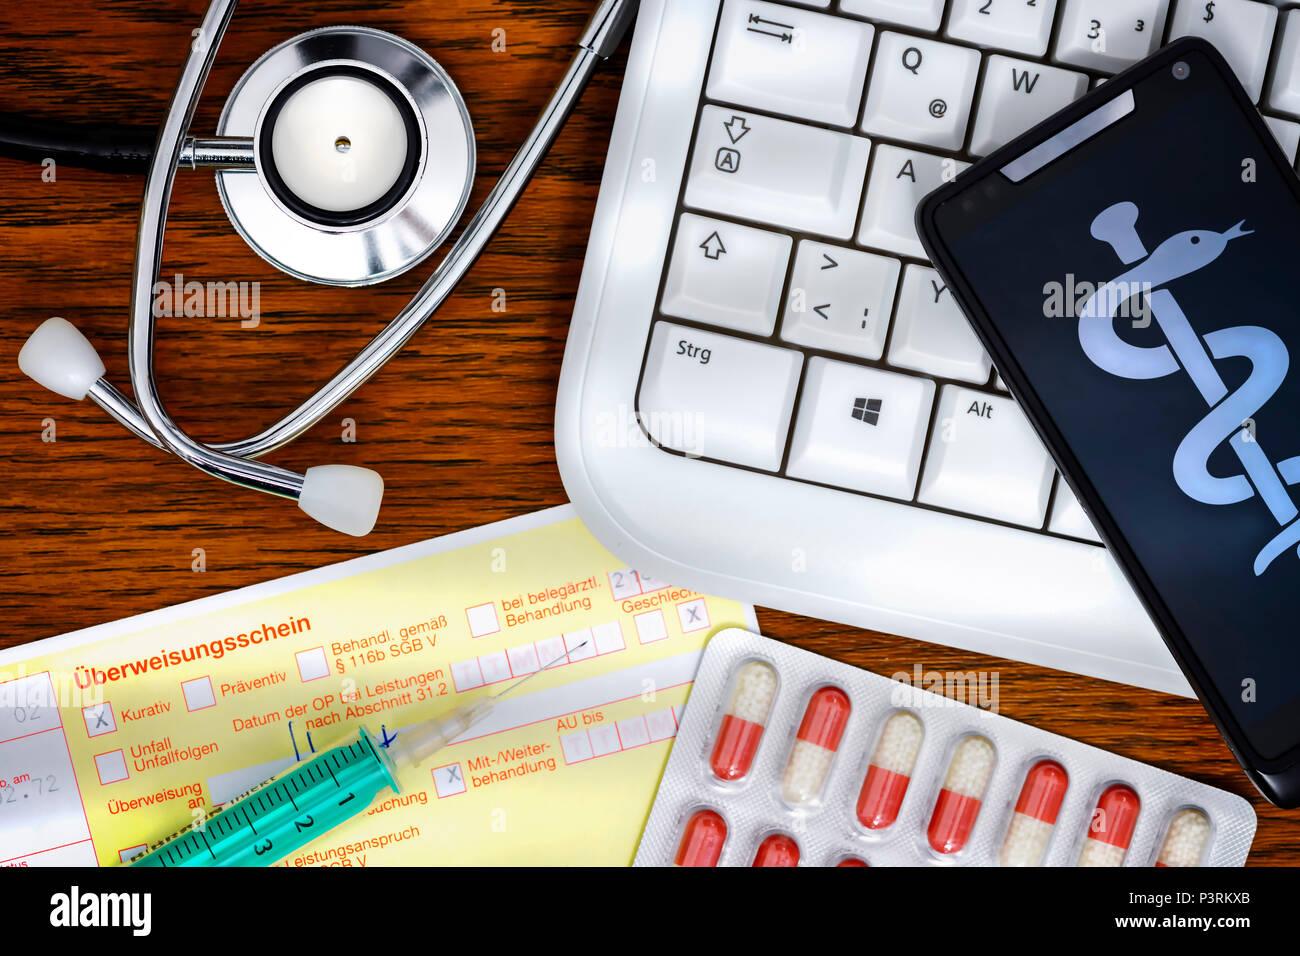 Stethoscope, computer keyboard and smartphone, telemedicine and remote treatment Photo icon, Stethoskop, Computertastatur und Smartphone, Symbolfoto T - Stock Image